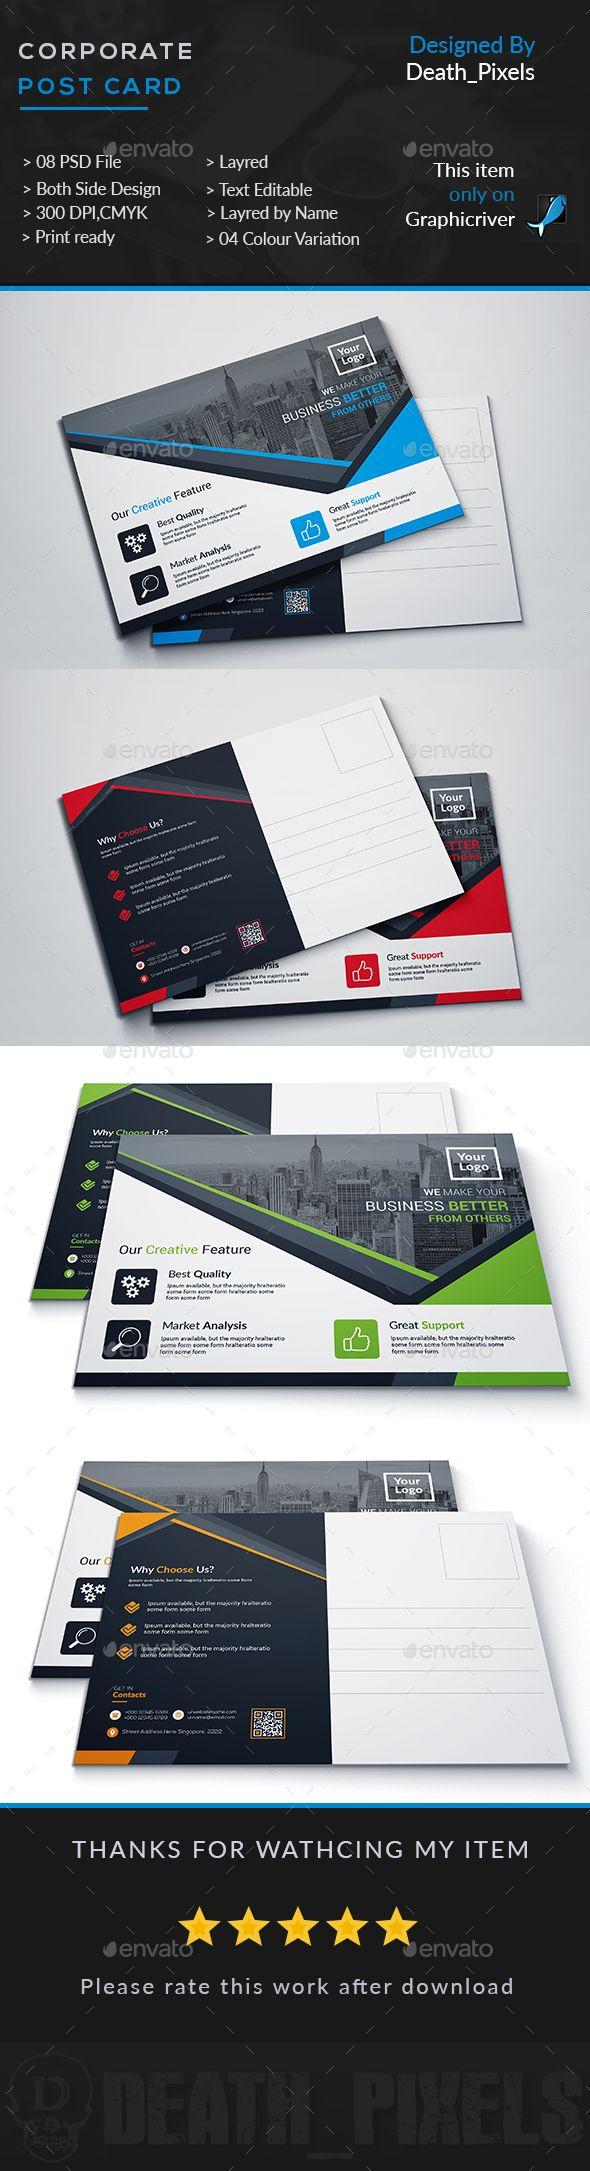 10 best Direct Mail Layouts images on Pinterest | Postcard design ...